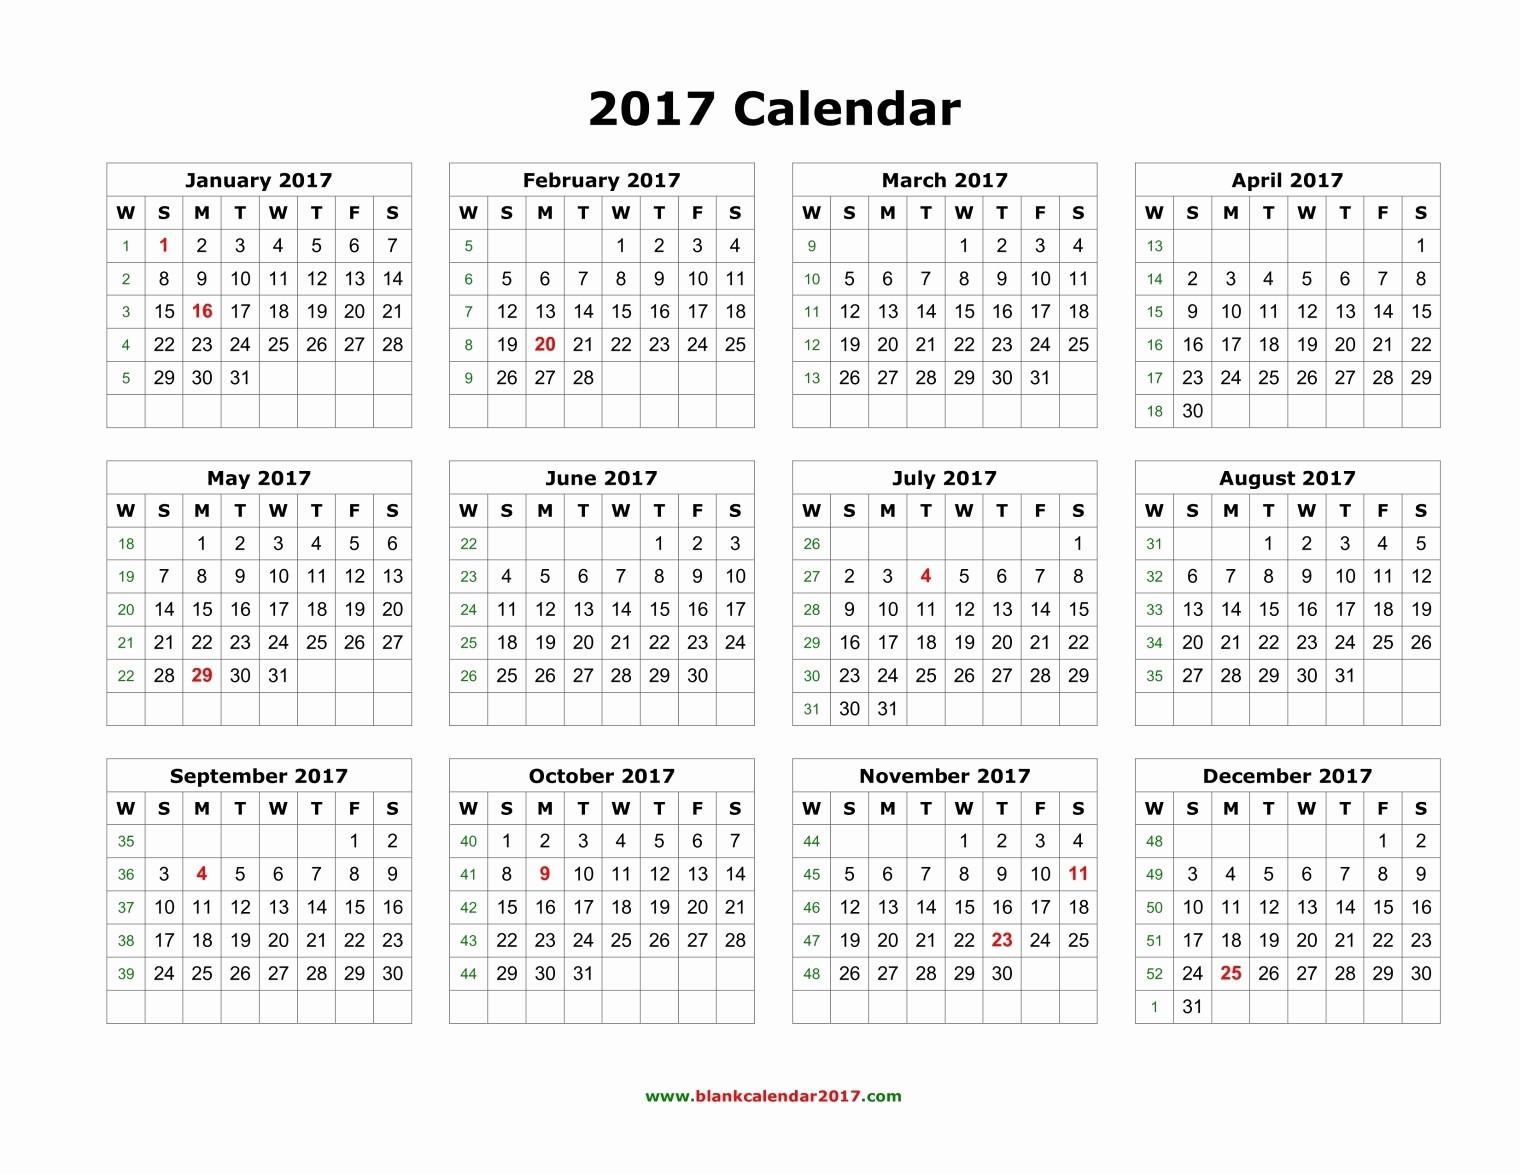 2017 Full Year Calendar Template Unique Blank Calendar 2017